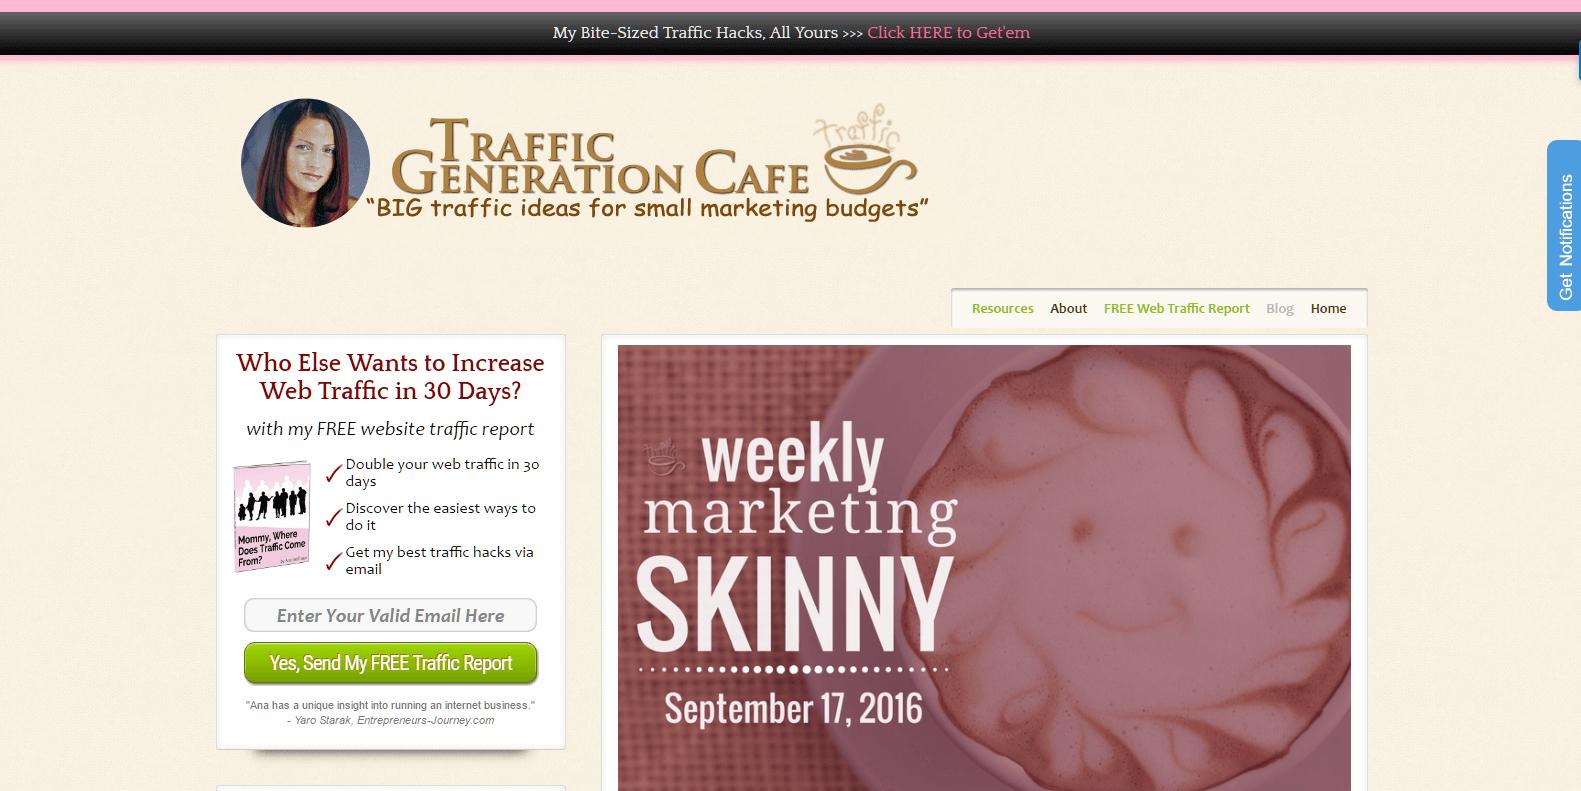 Ana's blog: Traffic Generation Cafe